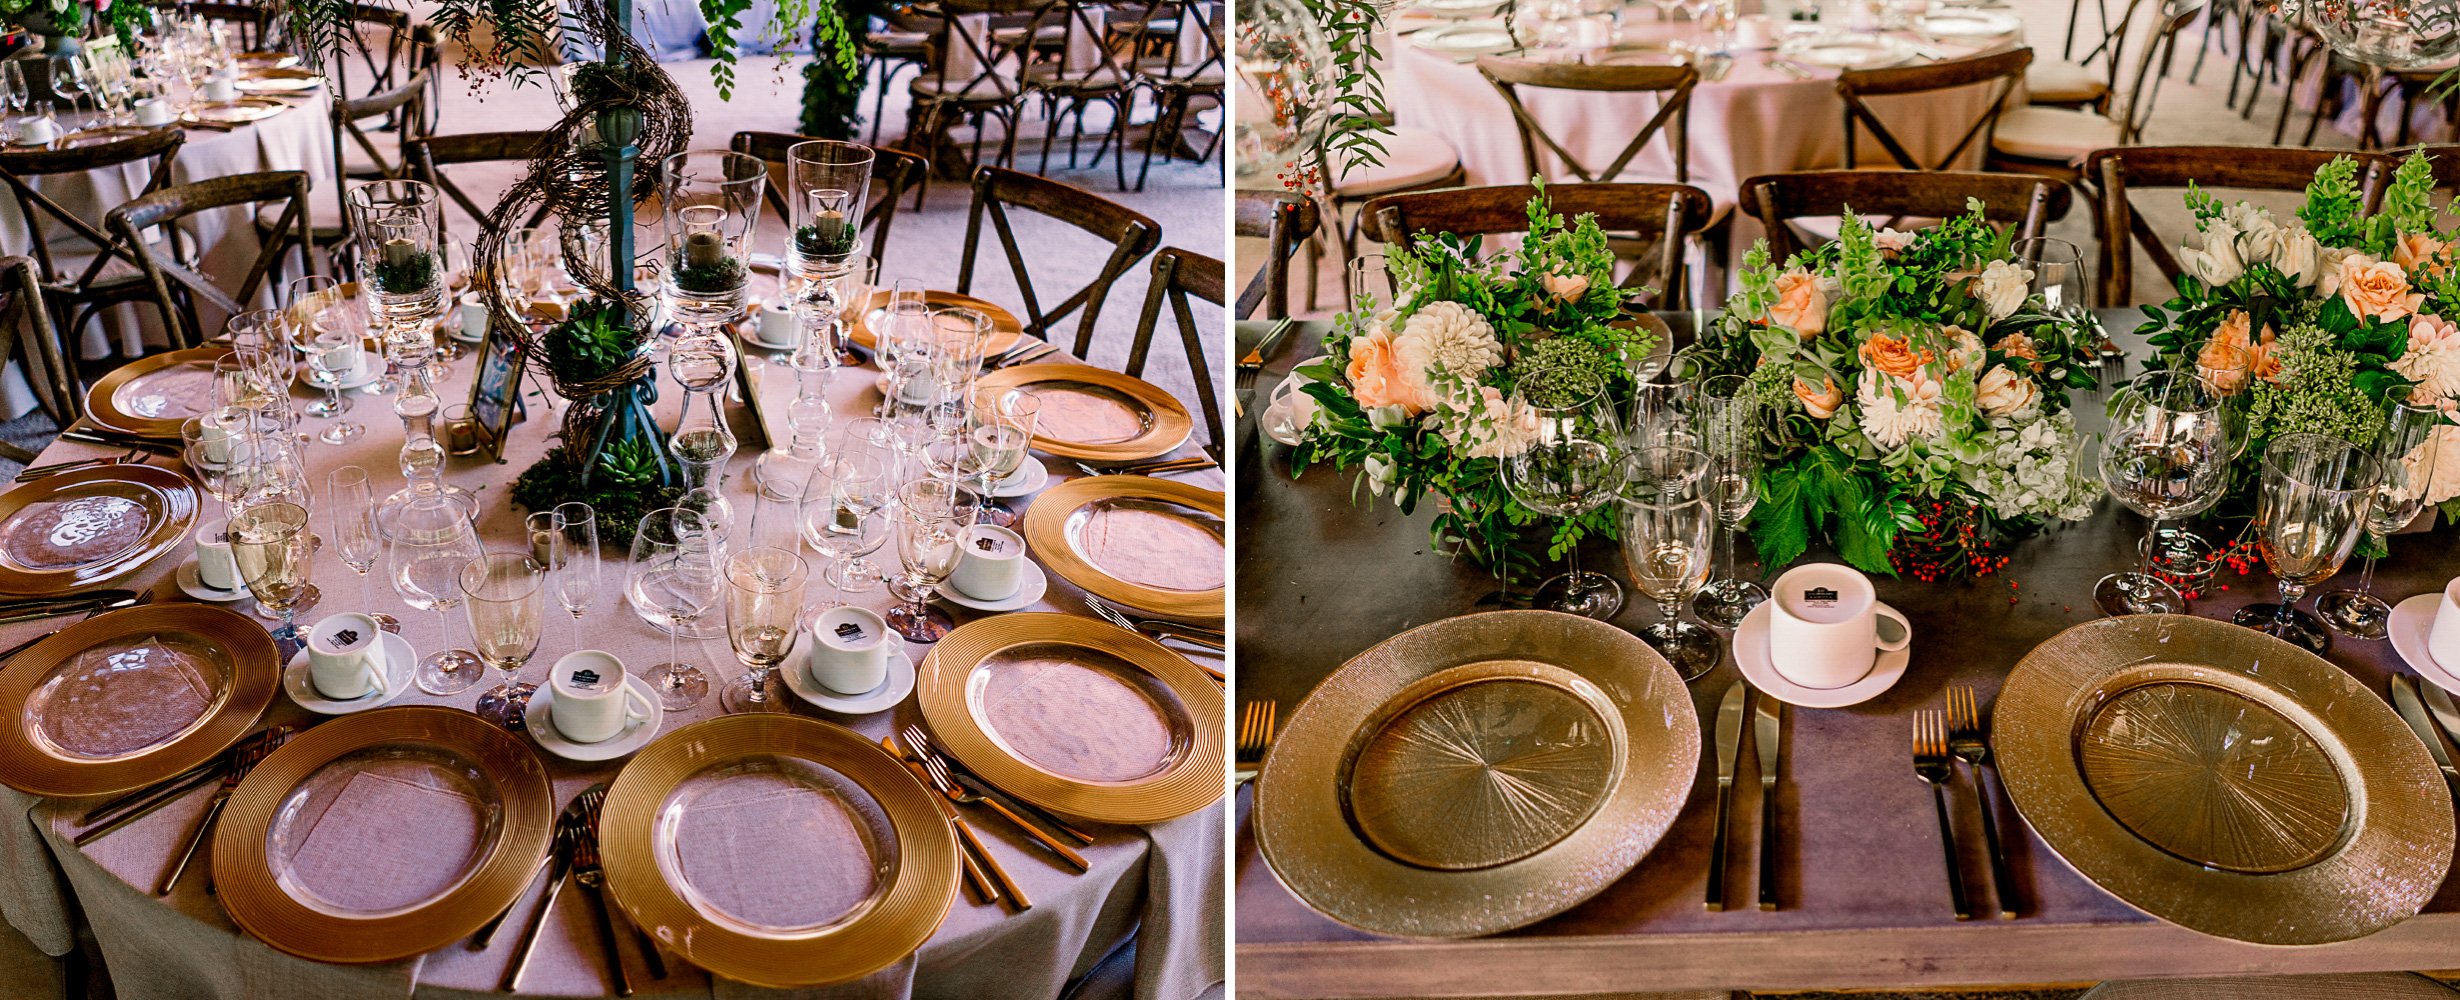 san diego wedding   photographer | table arrangement of plating with flower arrangement